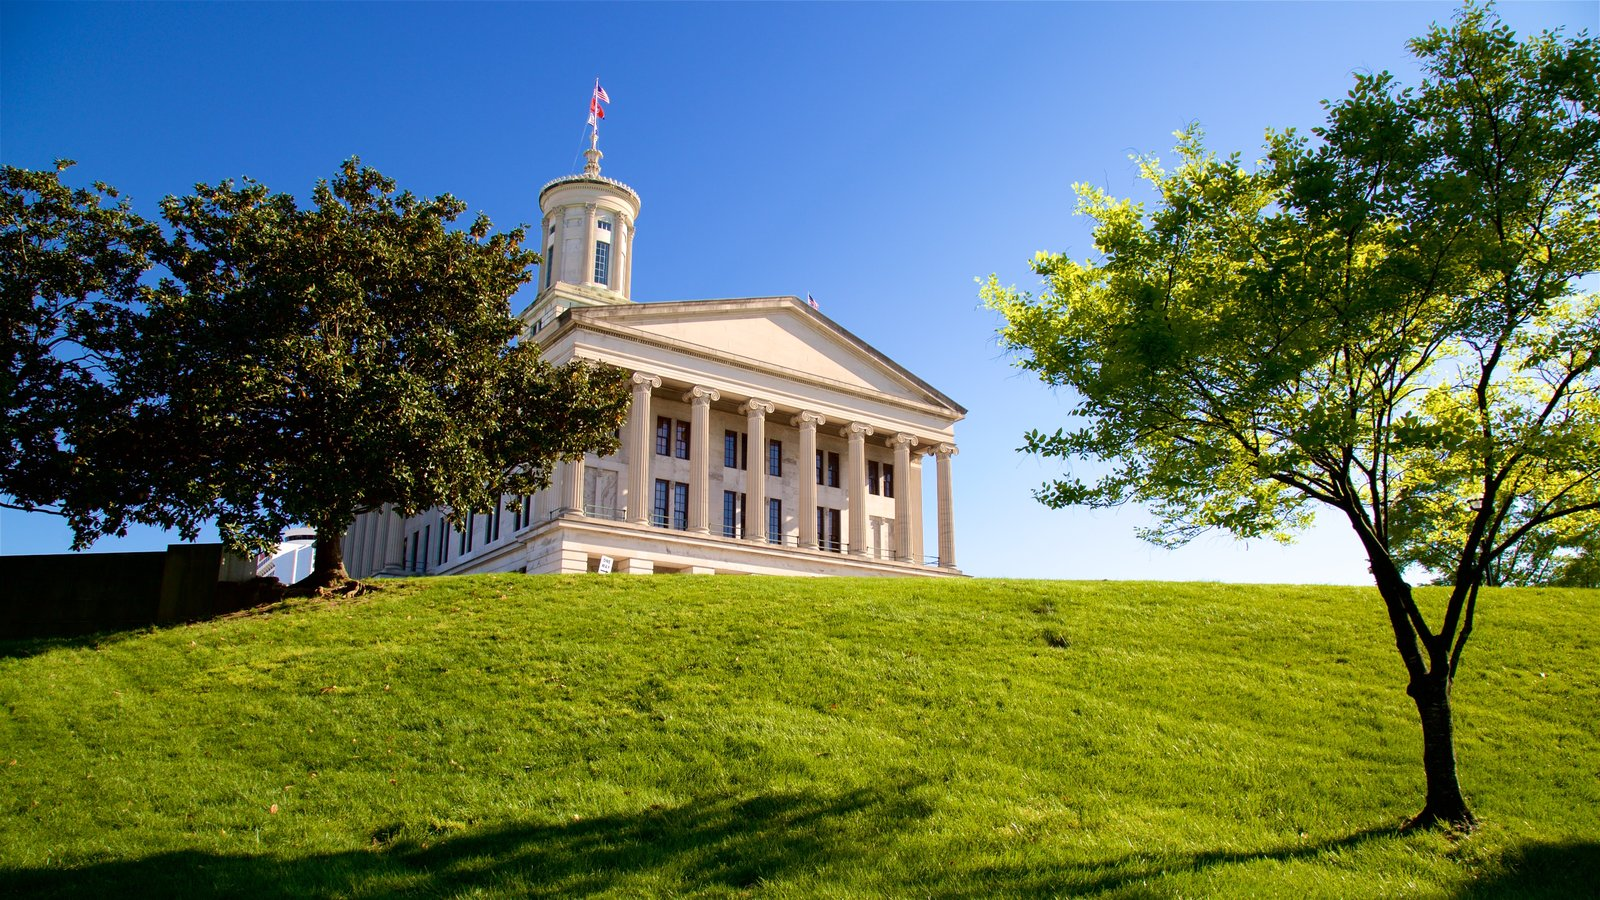 Tennessee State Capitol que incluye un parque y patrimonio de arquitectura